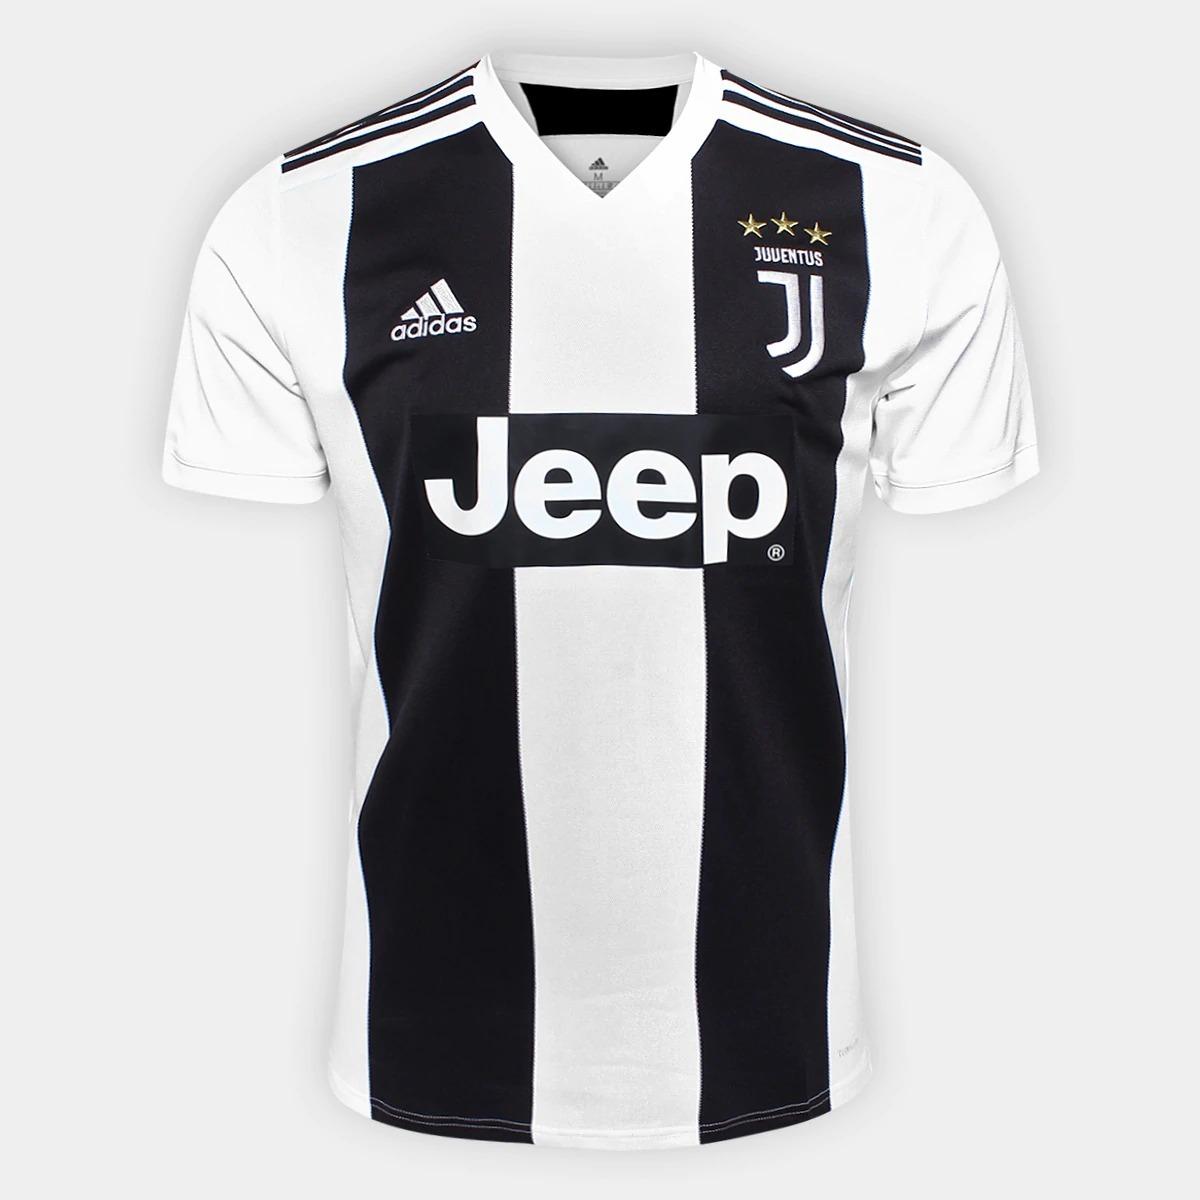 finest selection 156d4 edd5f Jersey De La Juventus Local 18/19, Ronaldo, Original...